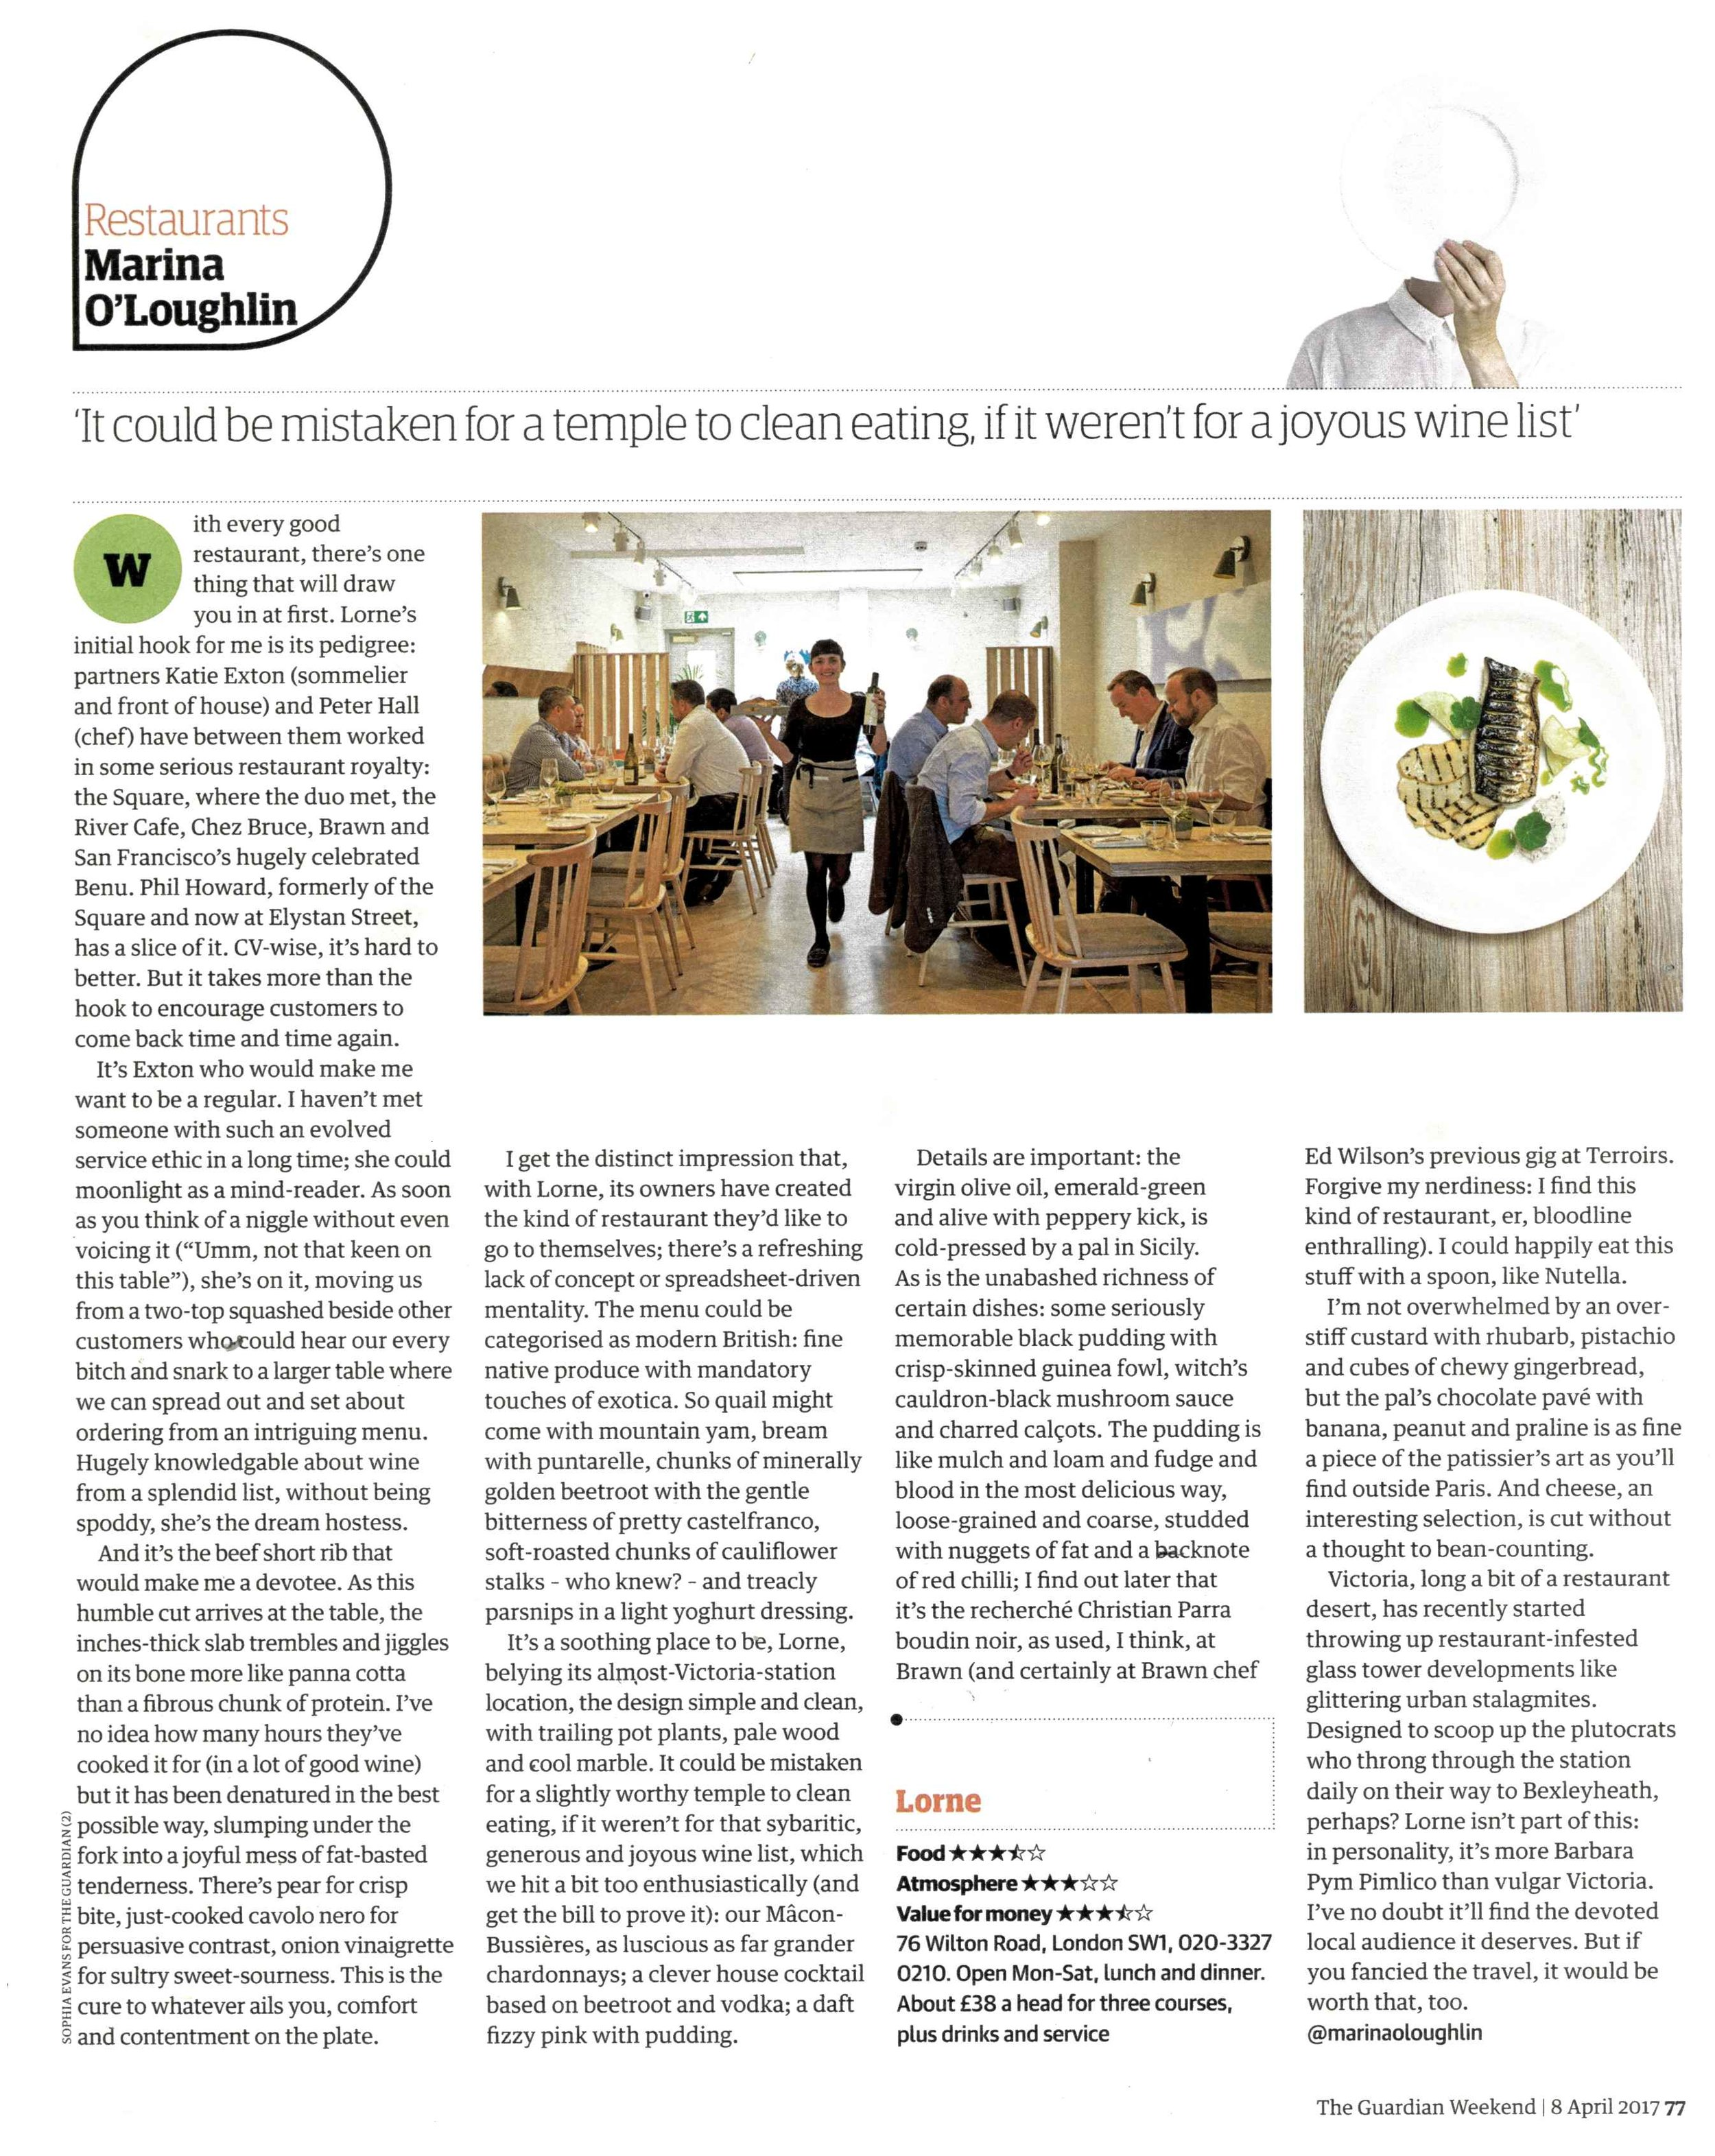 The Guardian Weekend - Lorne - Feature - 8 April 2017.jpg